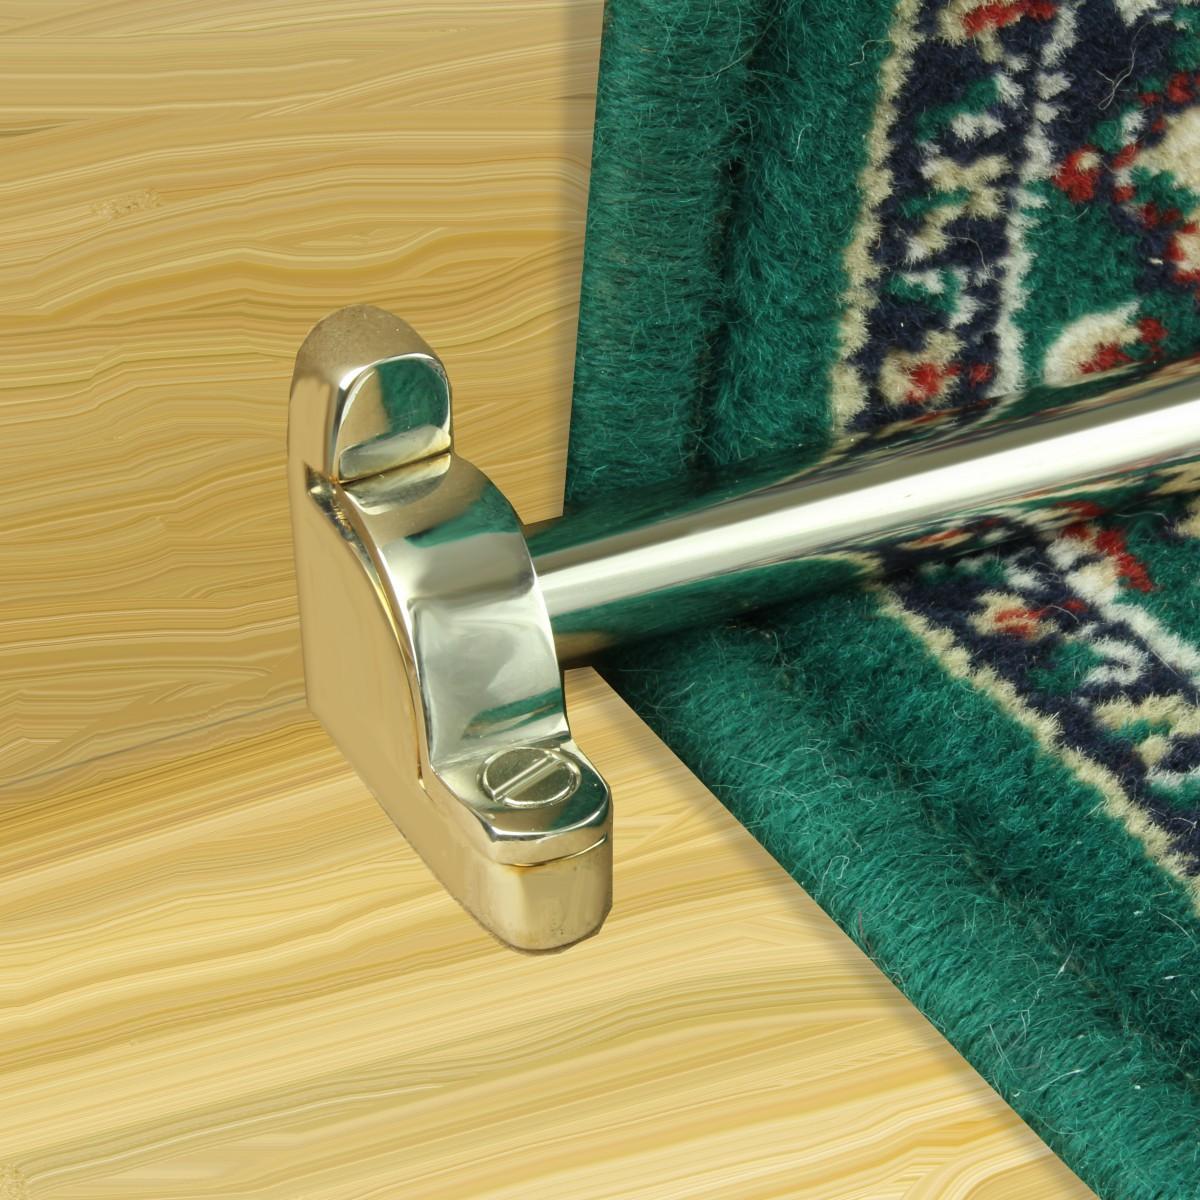 Polished Nickel Carpet Rods for Stair Runner Rod Holder Includes Brackets Carpet Runner Rod Carpet Runner Holders Stair Runner Brackets